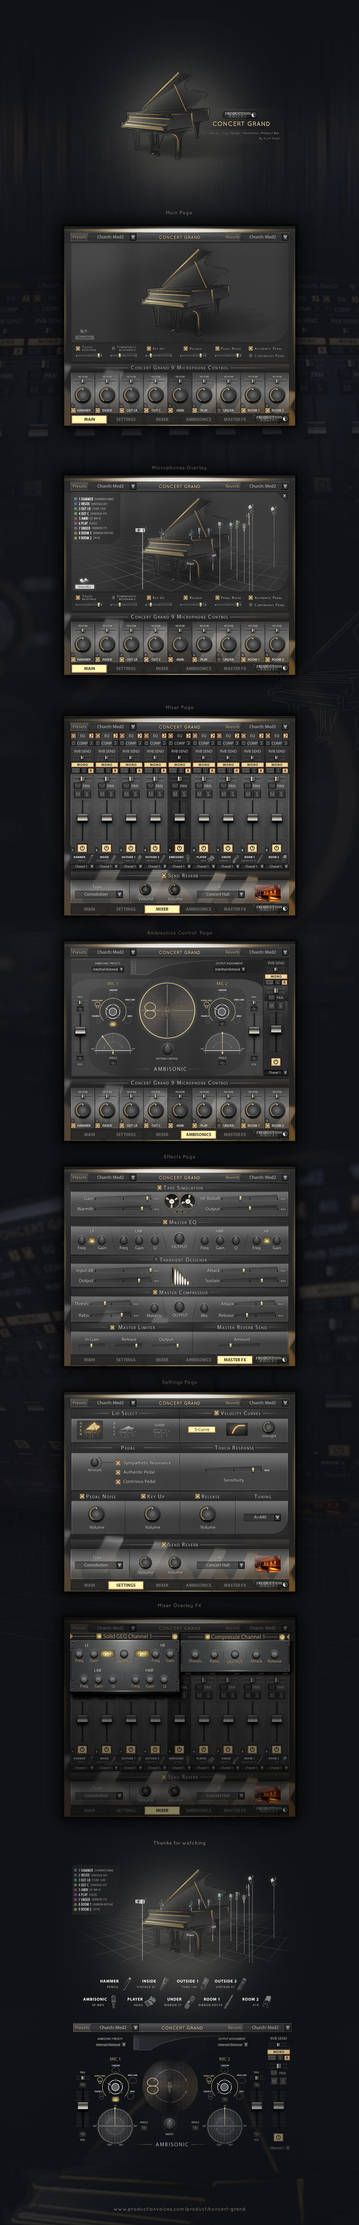 Concert Grand Piano User Interface Design by Scott-Kane